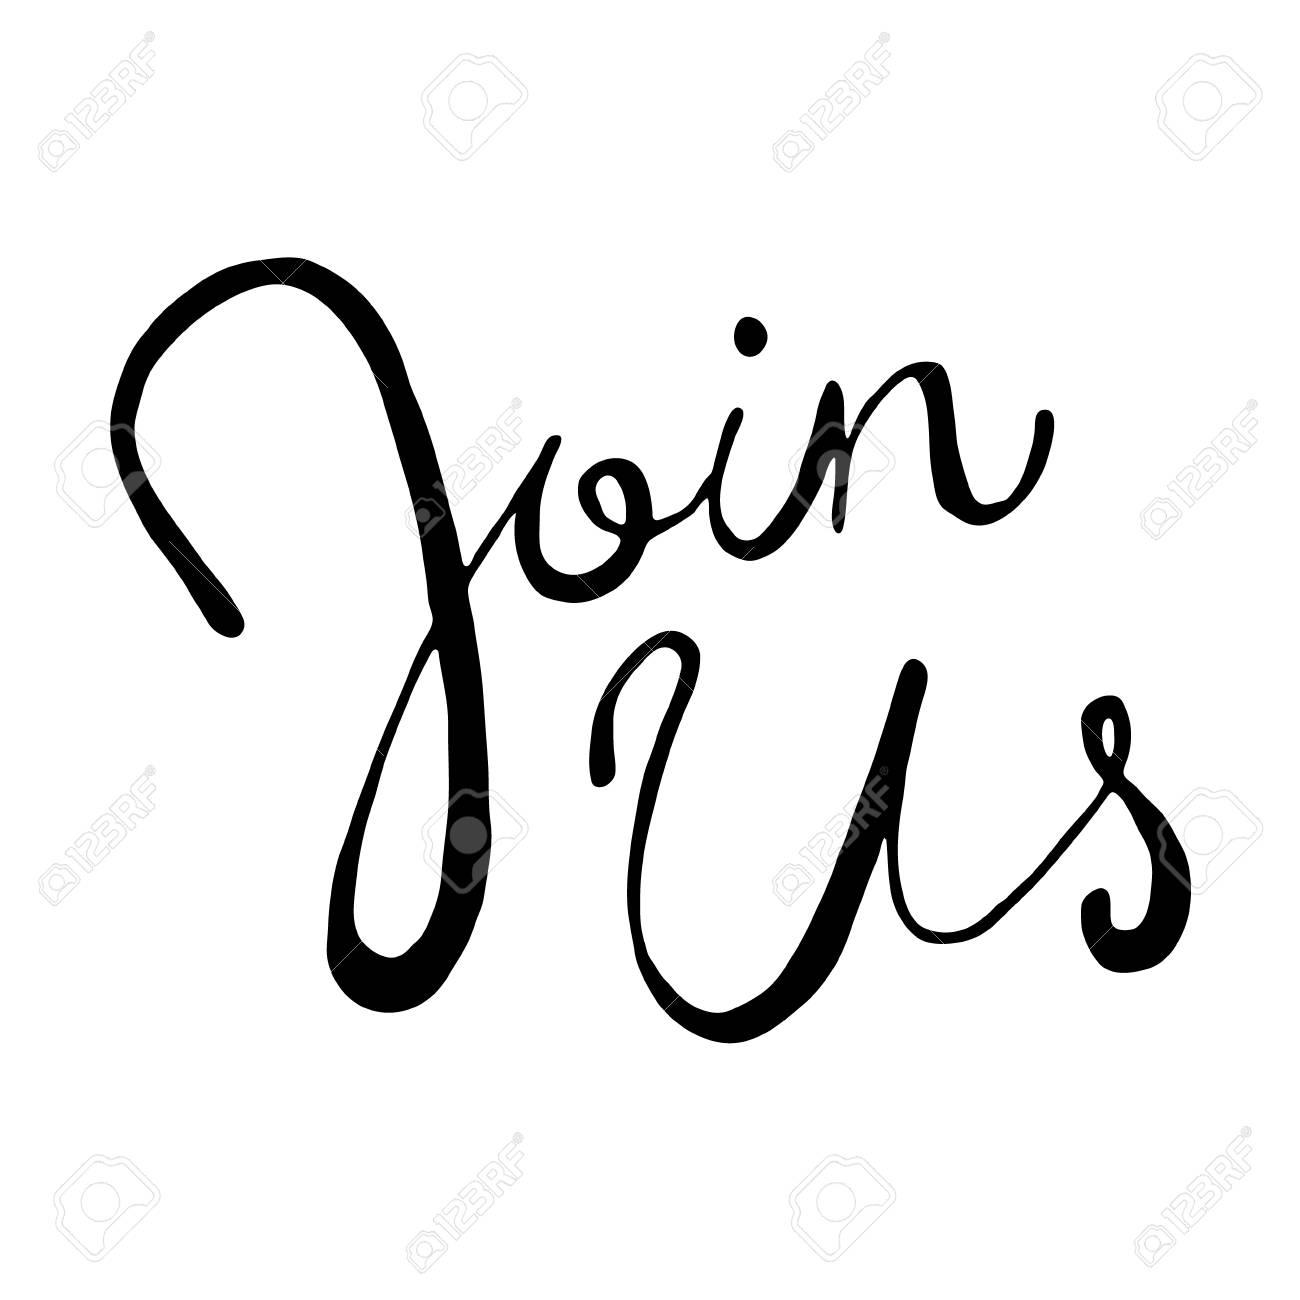 Join us lettering. Hand written phrase.